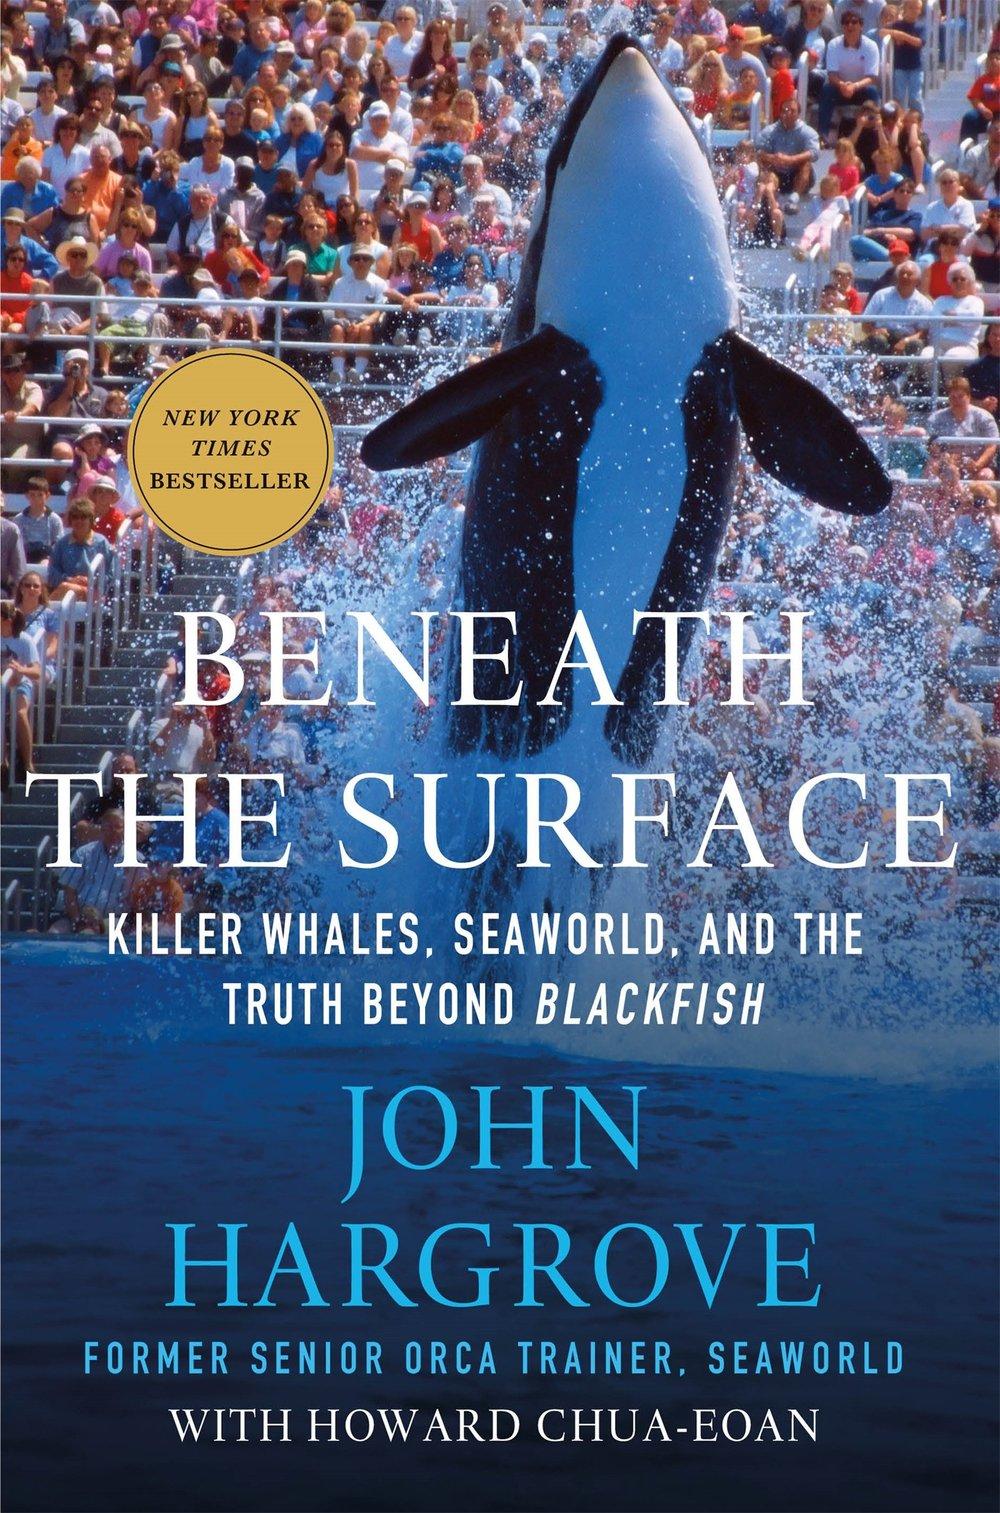 Beyond the Surface | John Hargrove